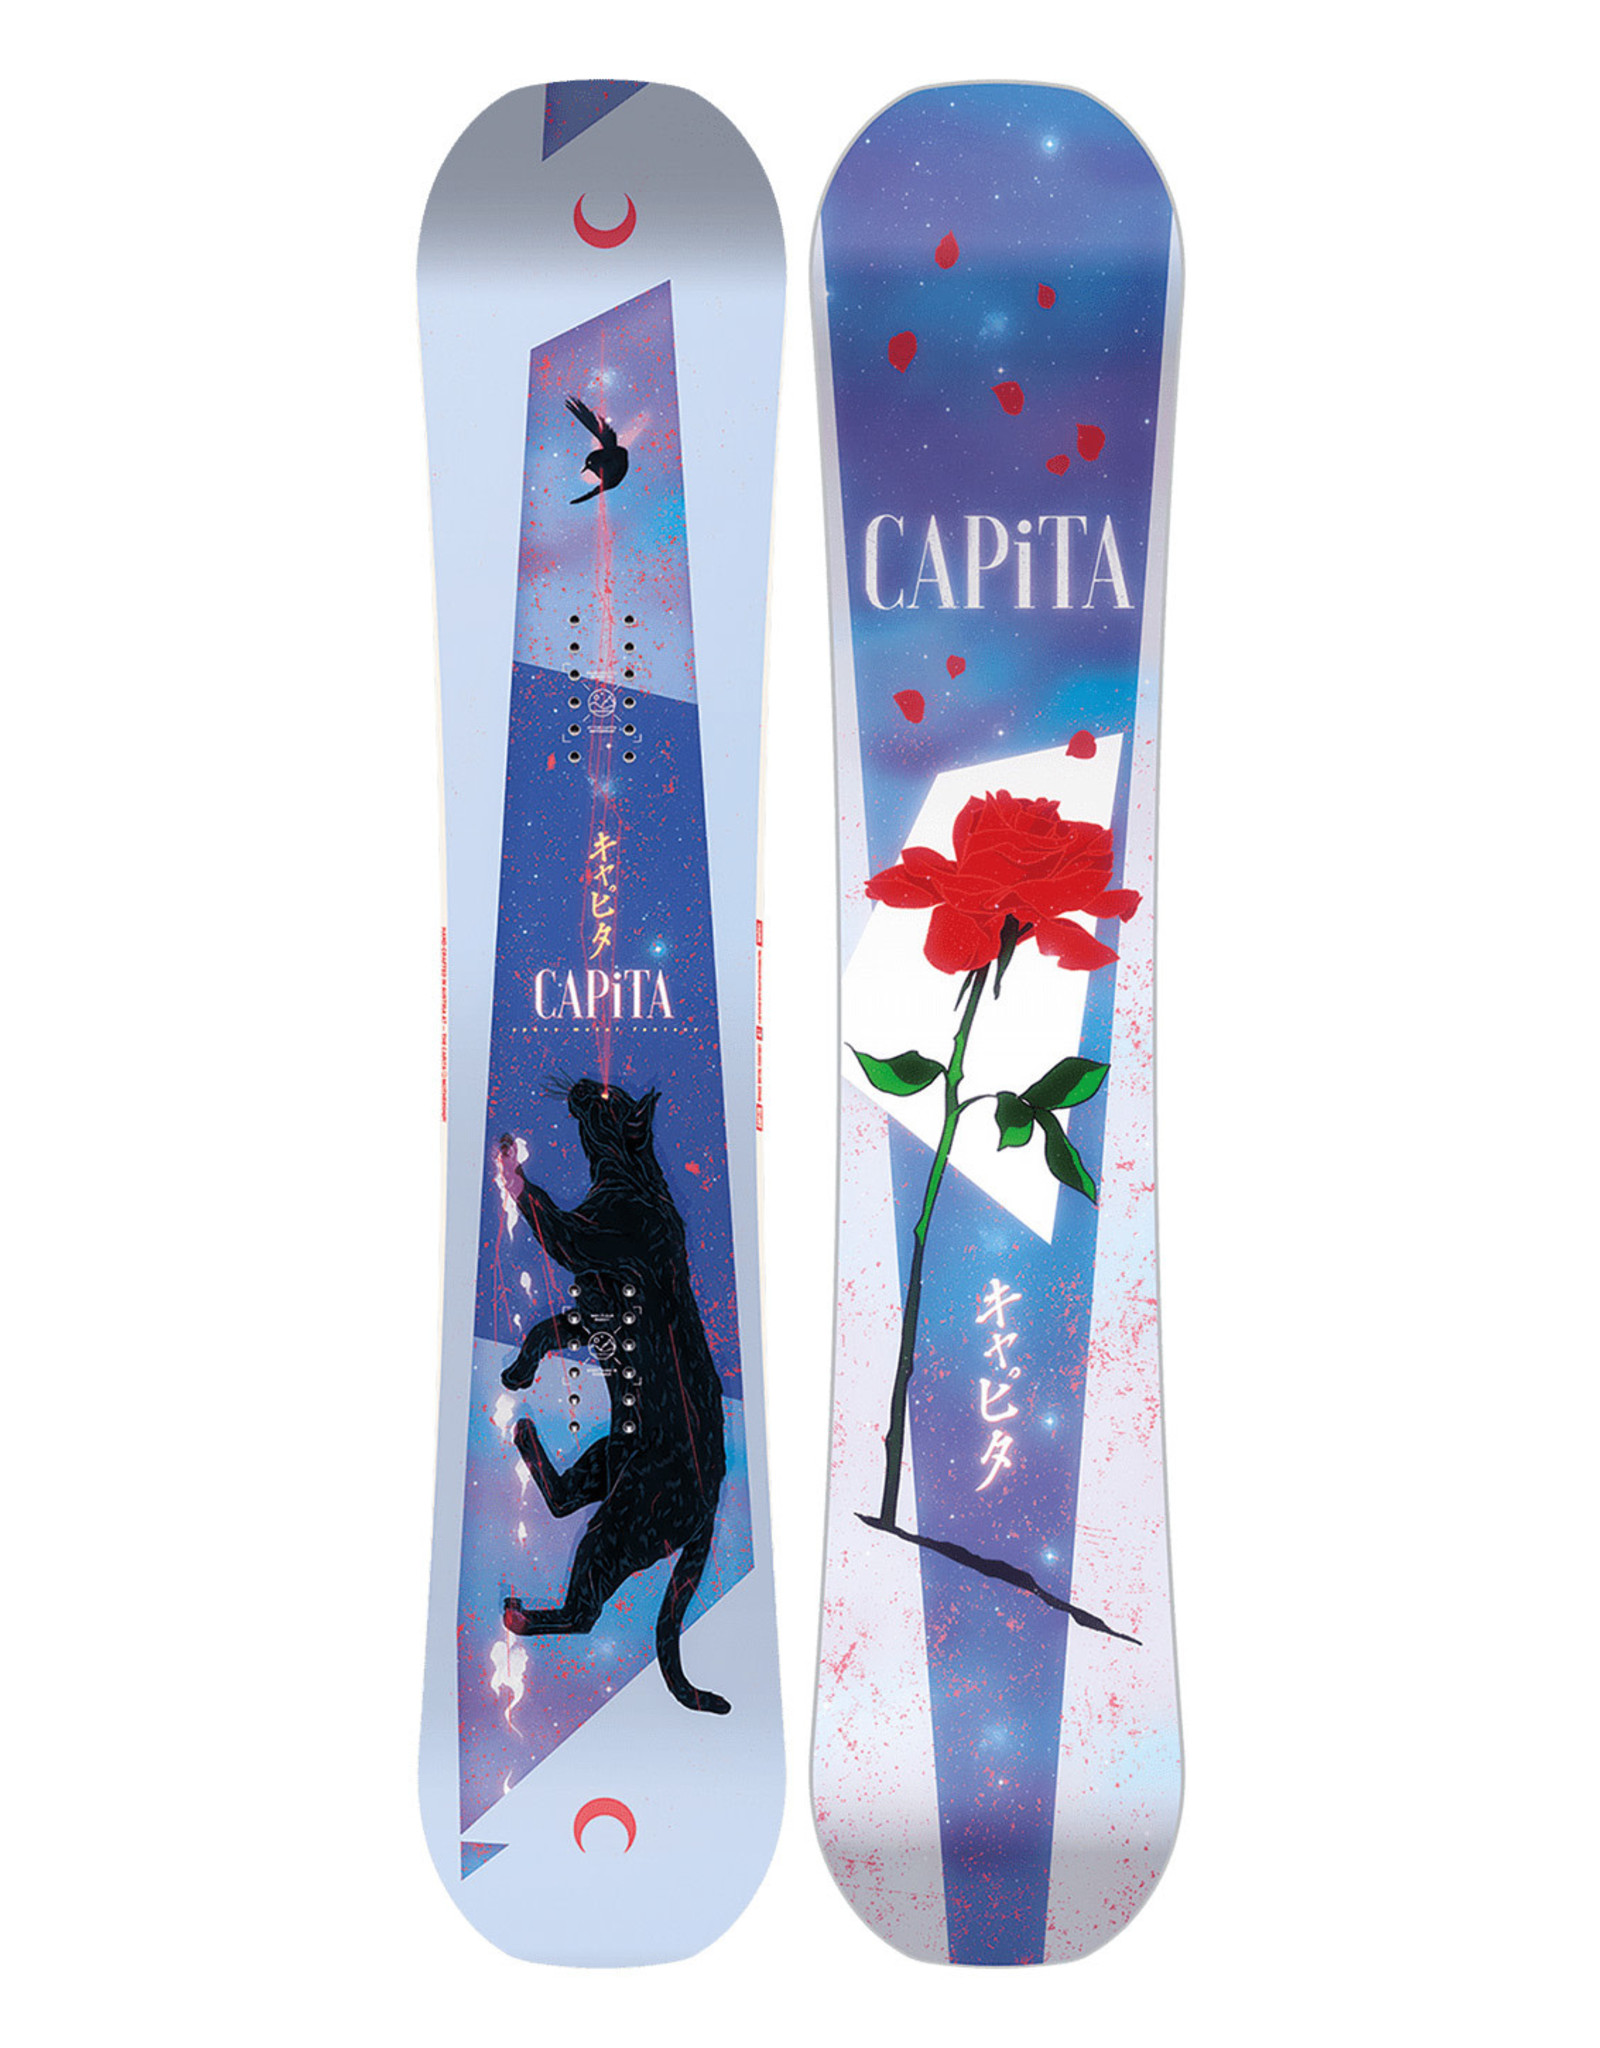 Capita - SPACE METAL FANTASY (2021) - 147cm